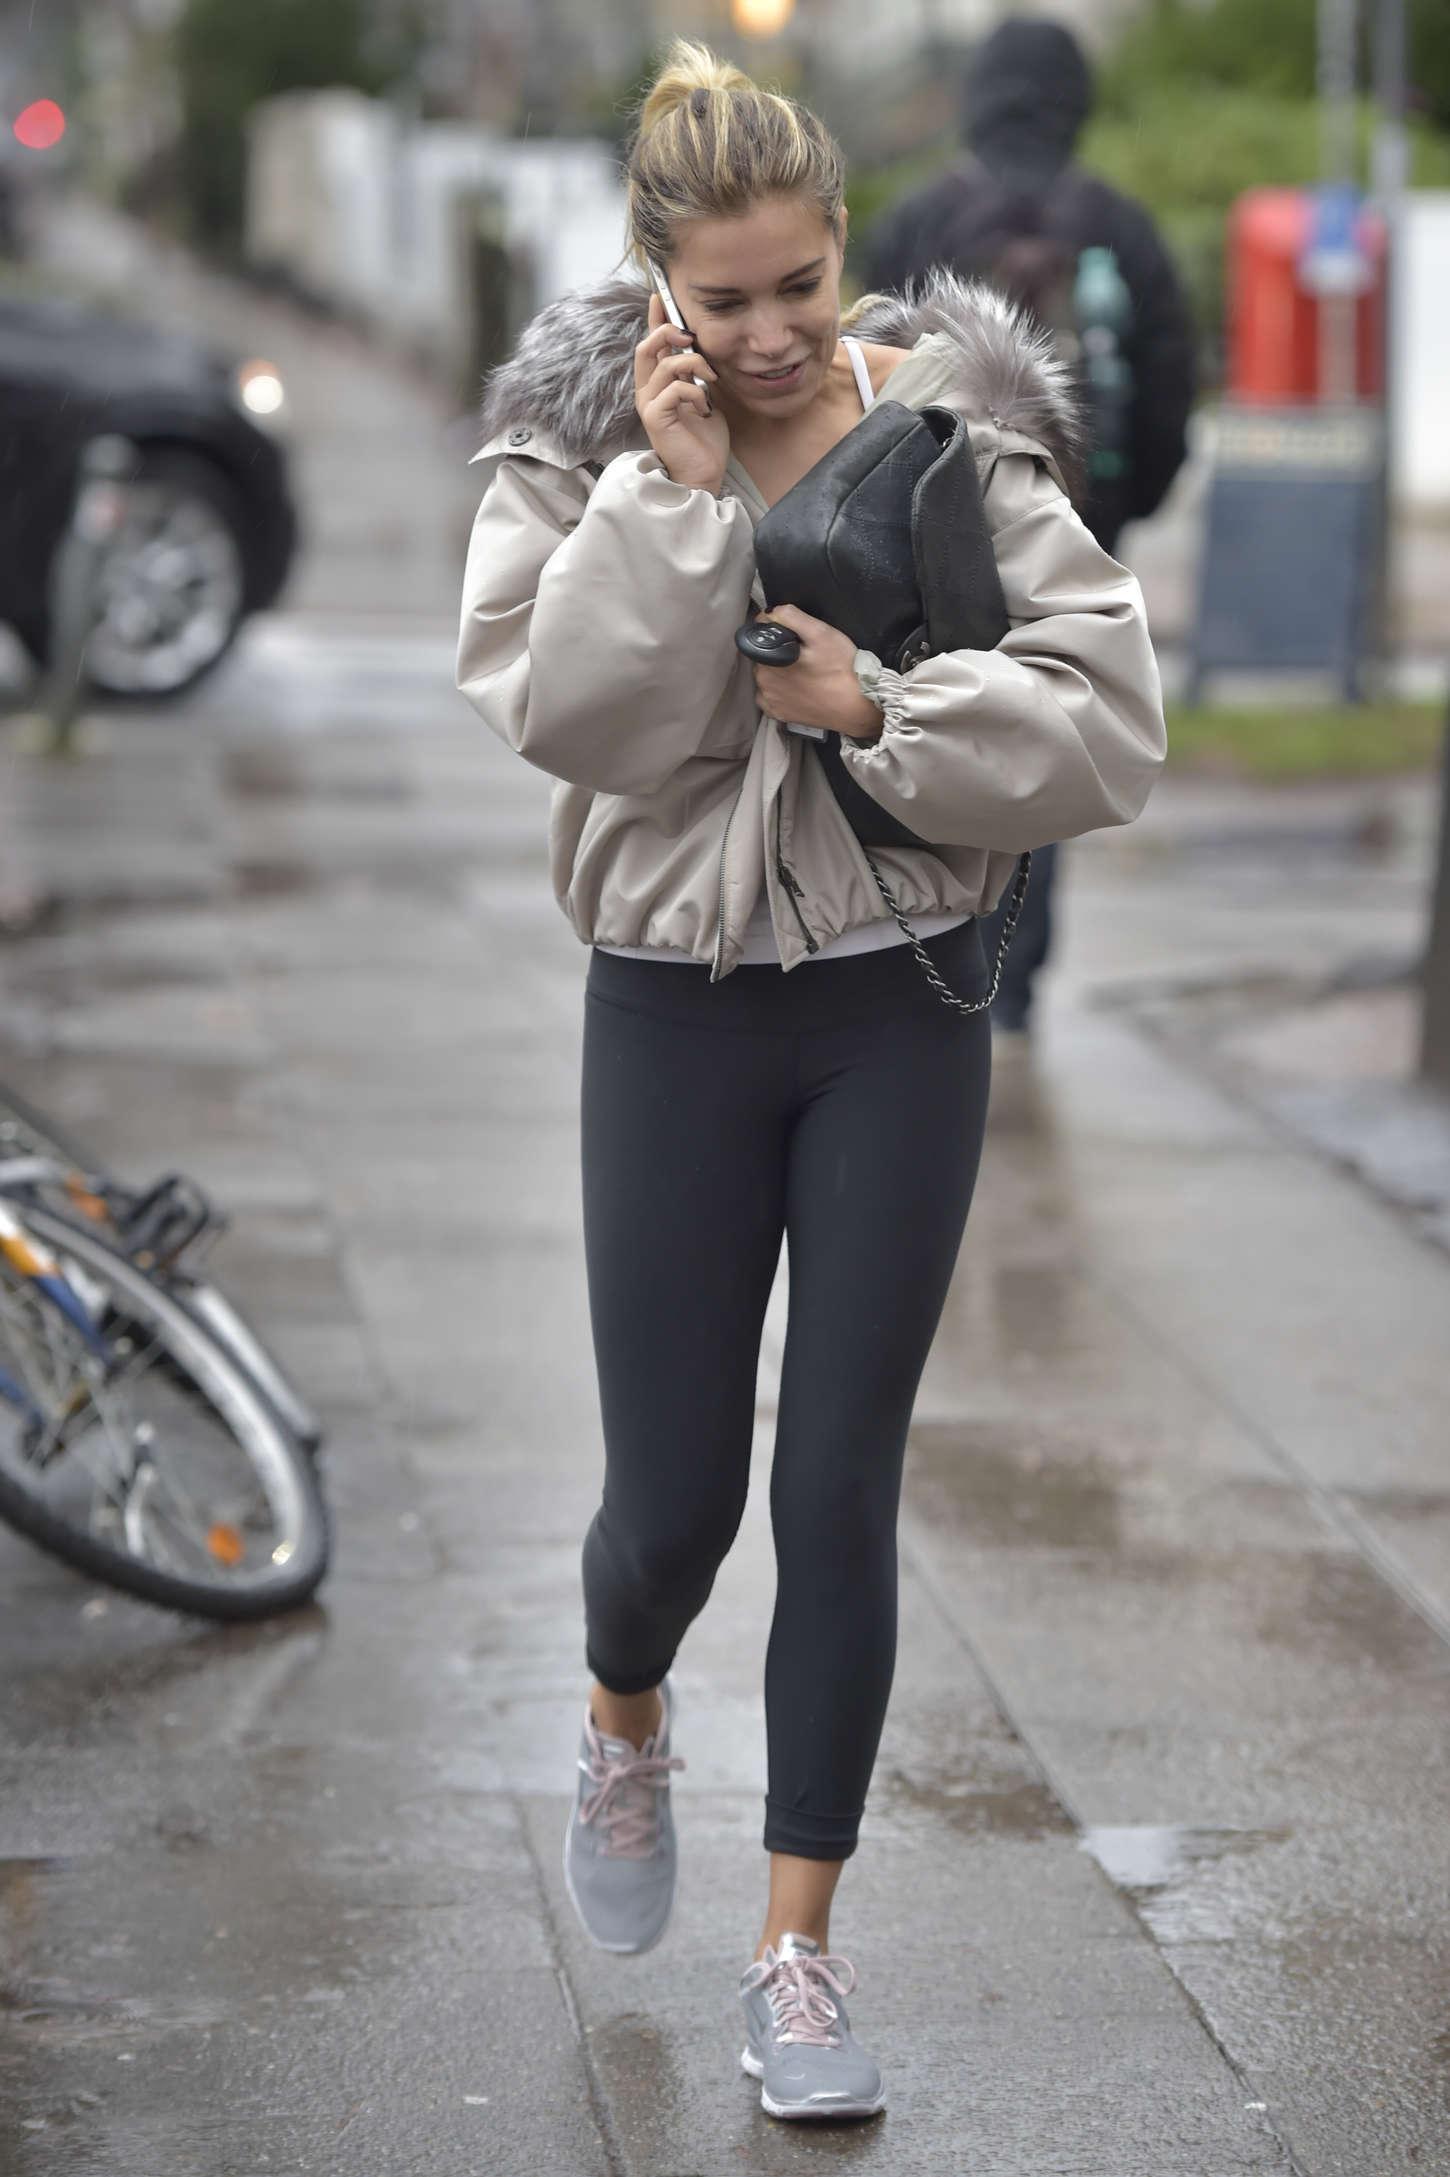 Sylvie Meis in Tight Leggings -16 - GotCeleb